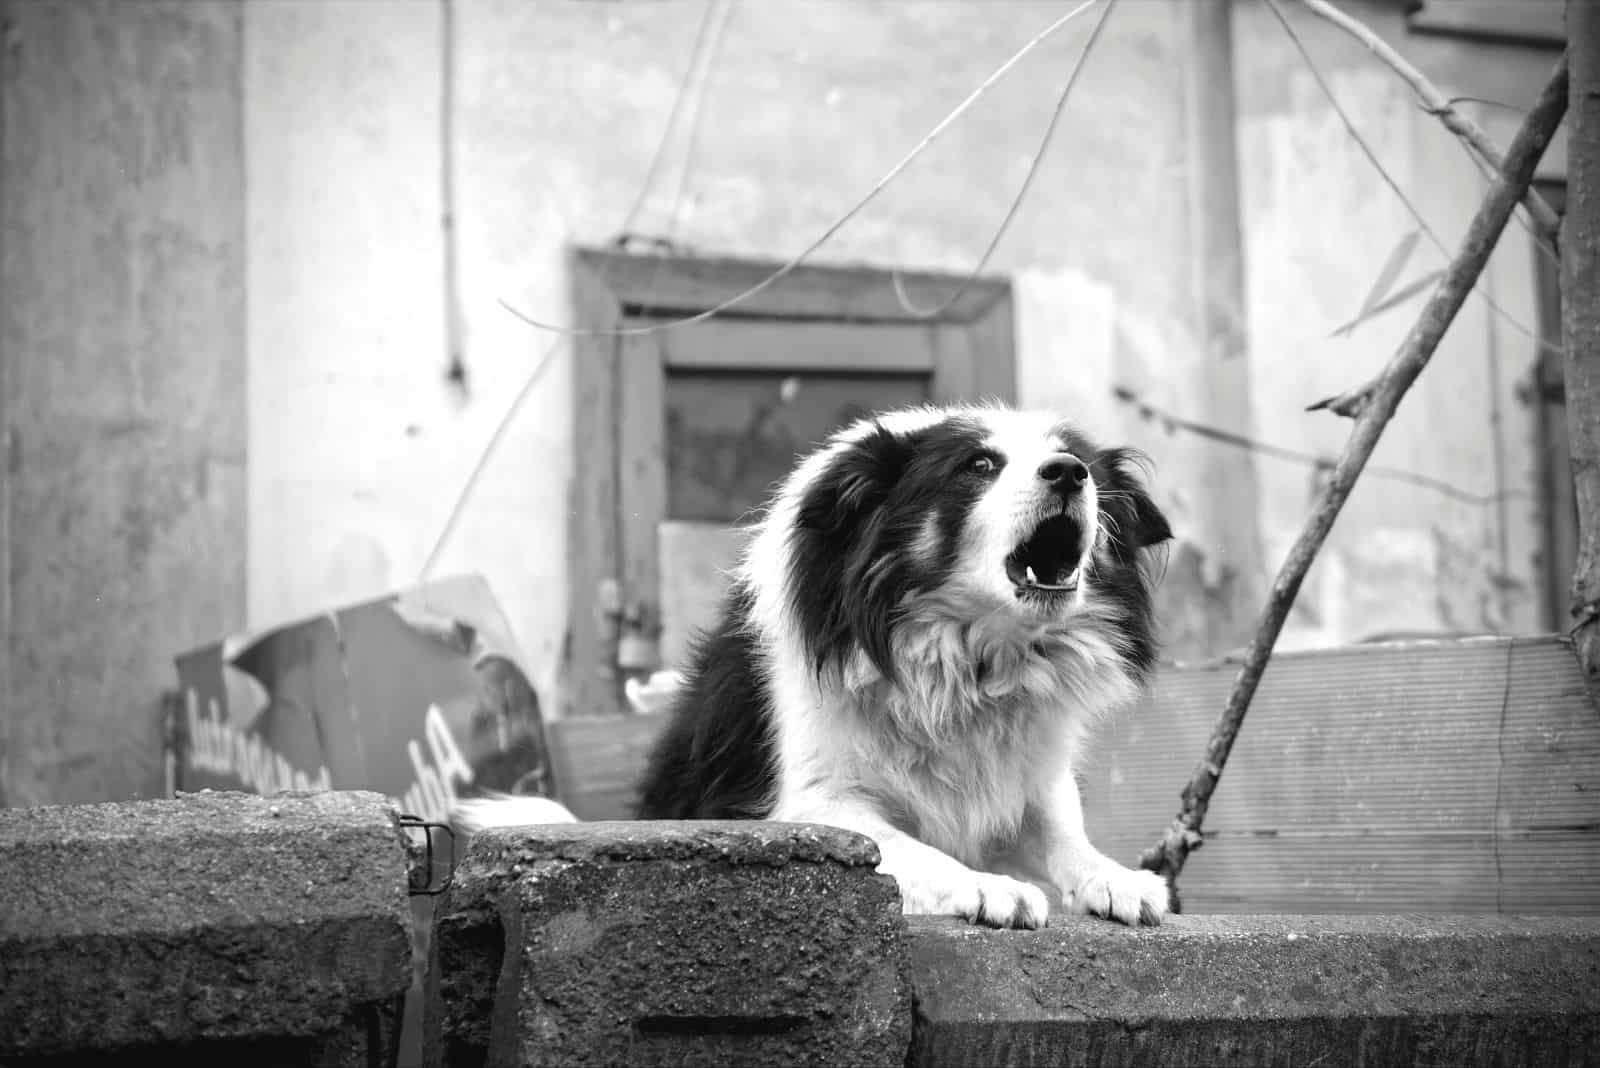 border collie barking in monochrome photo